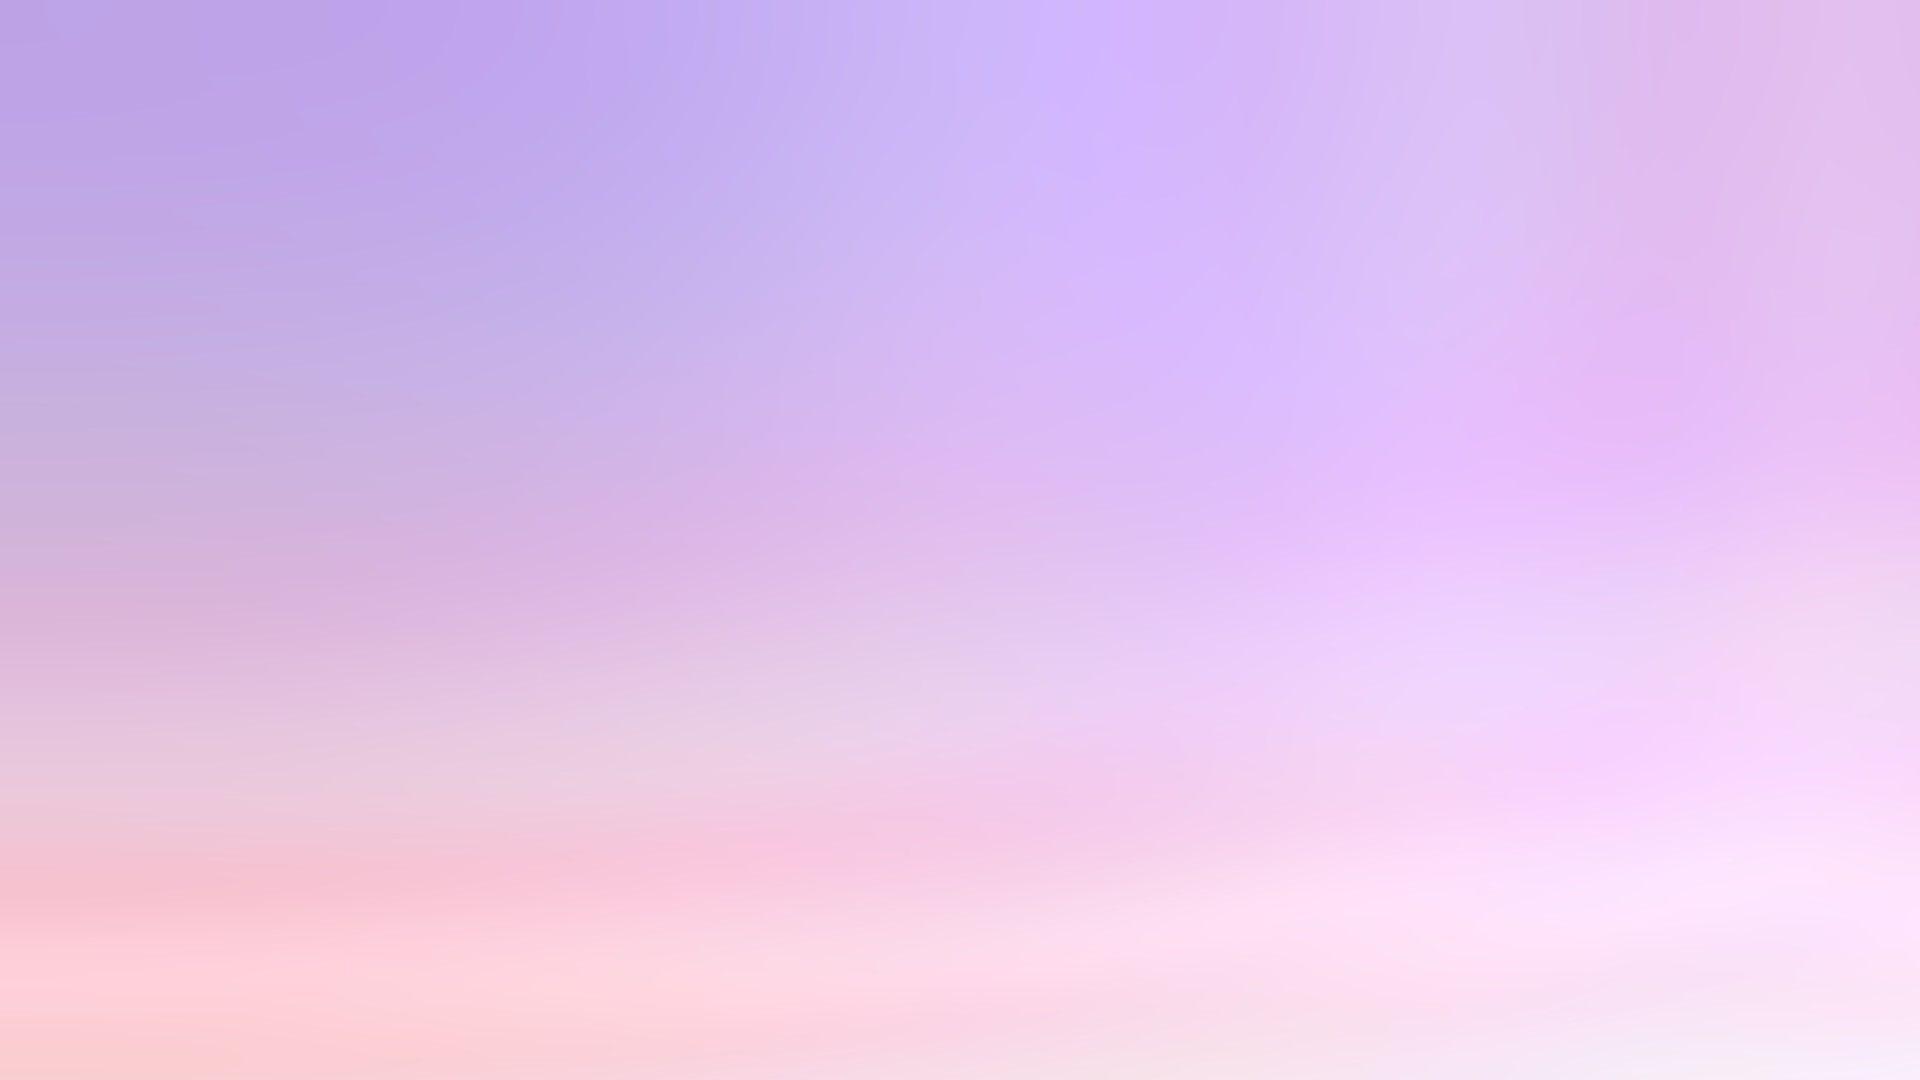 Wallpaper Tumblr Ungu Hd